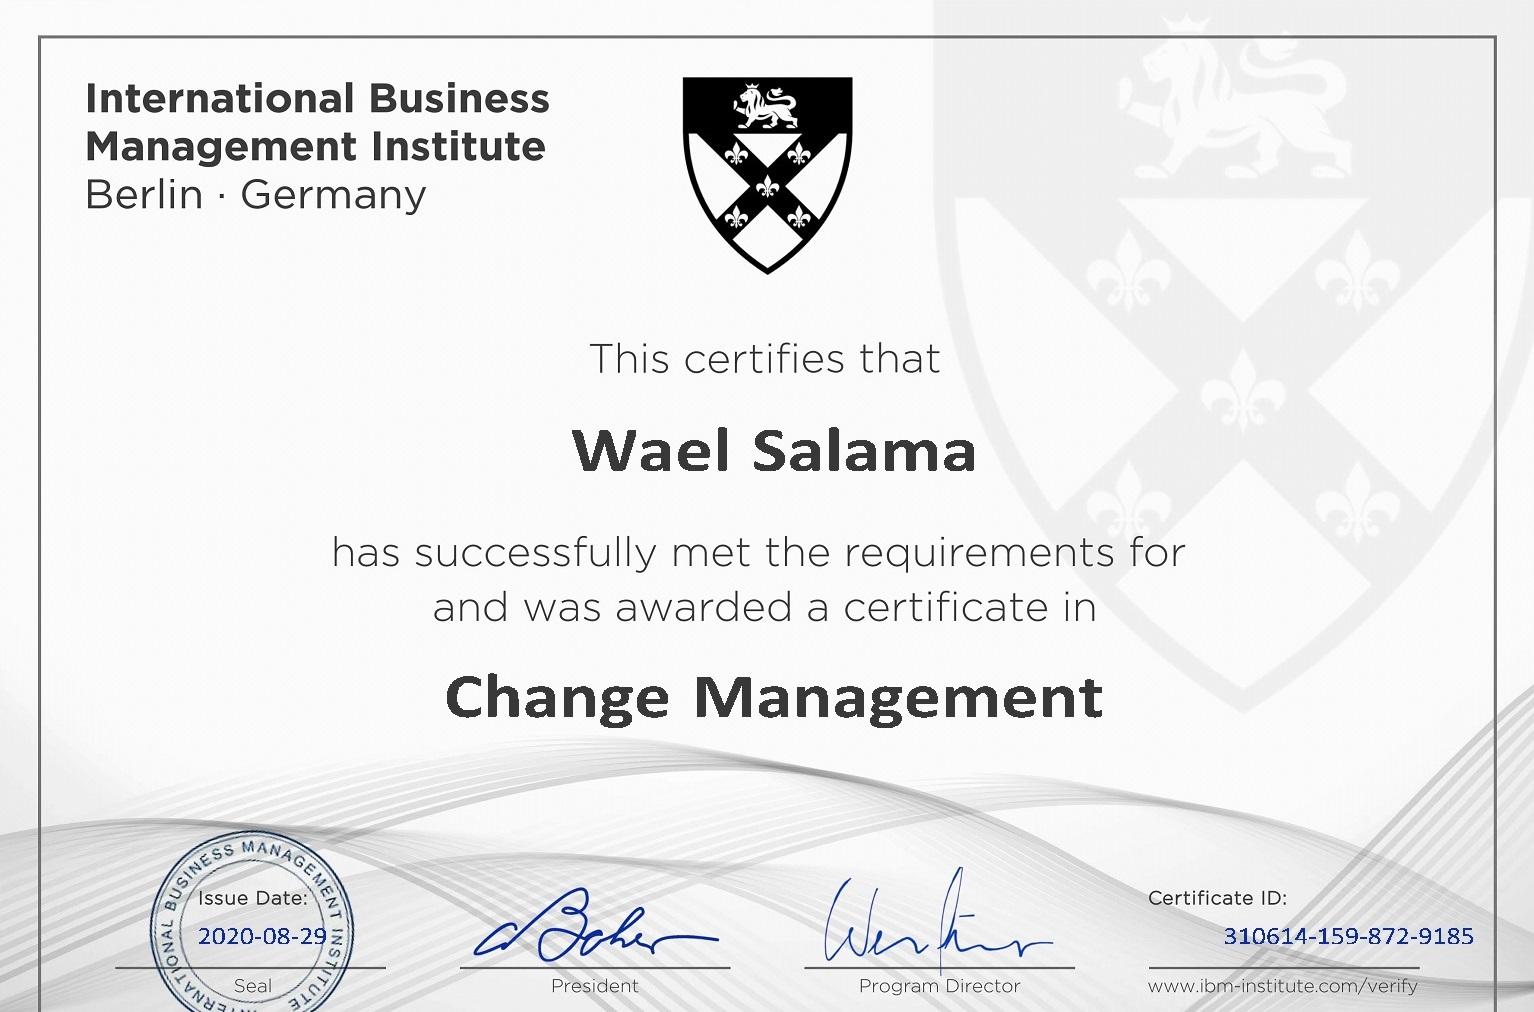 certificate management change certification salama wael